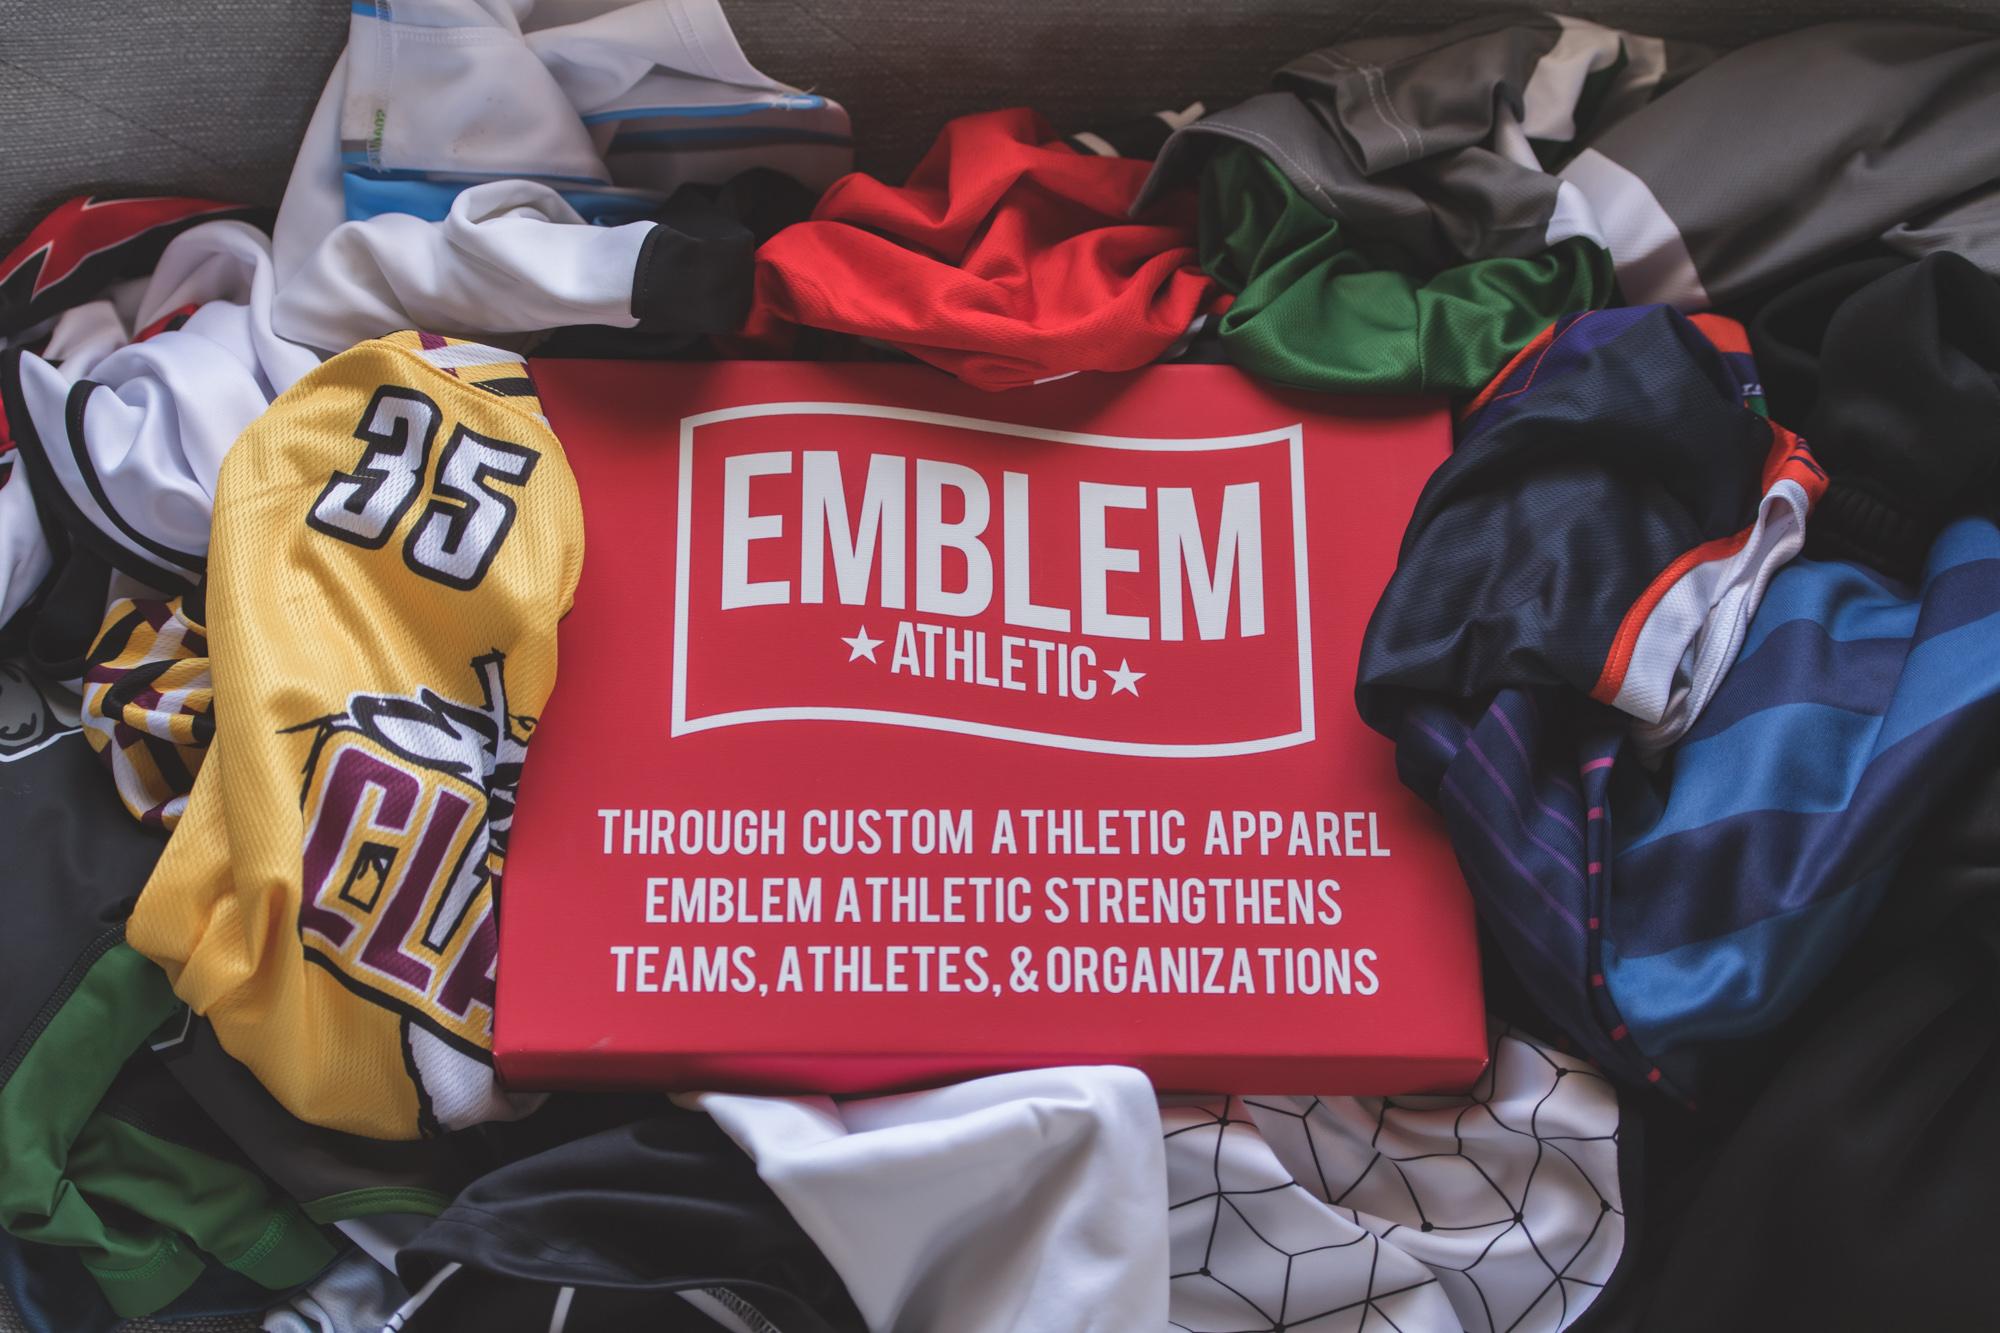 Columbus, oh - emblem athletic